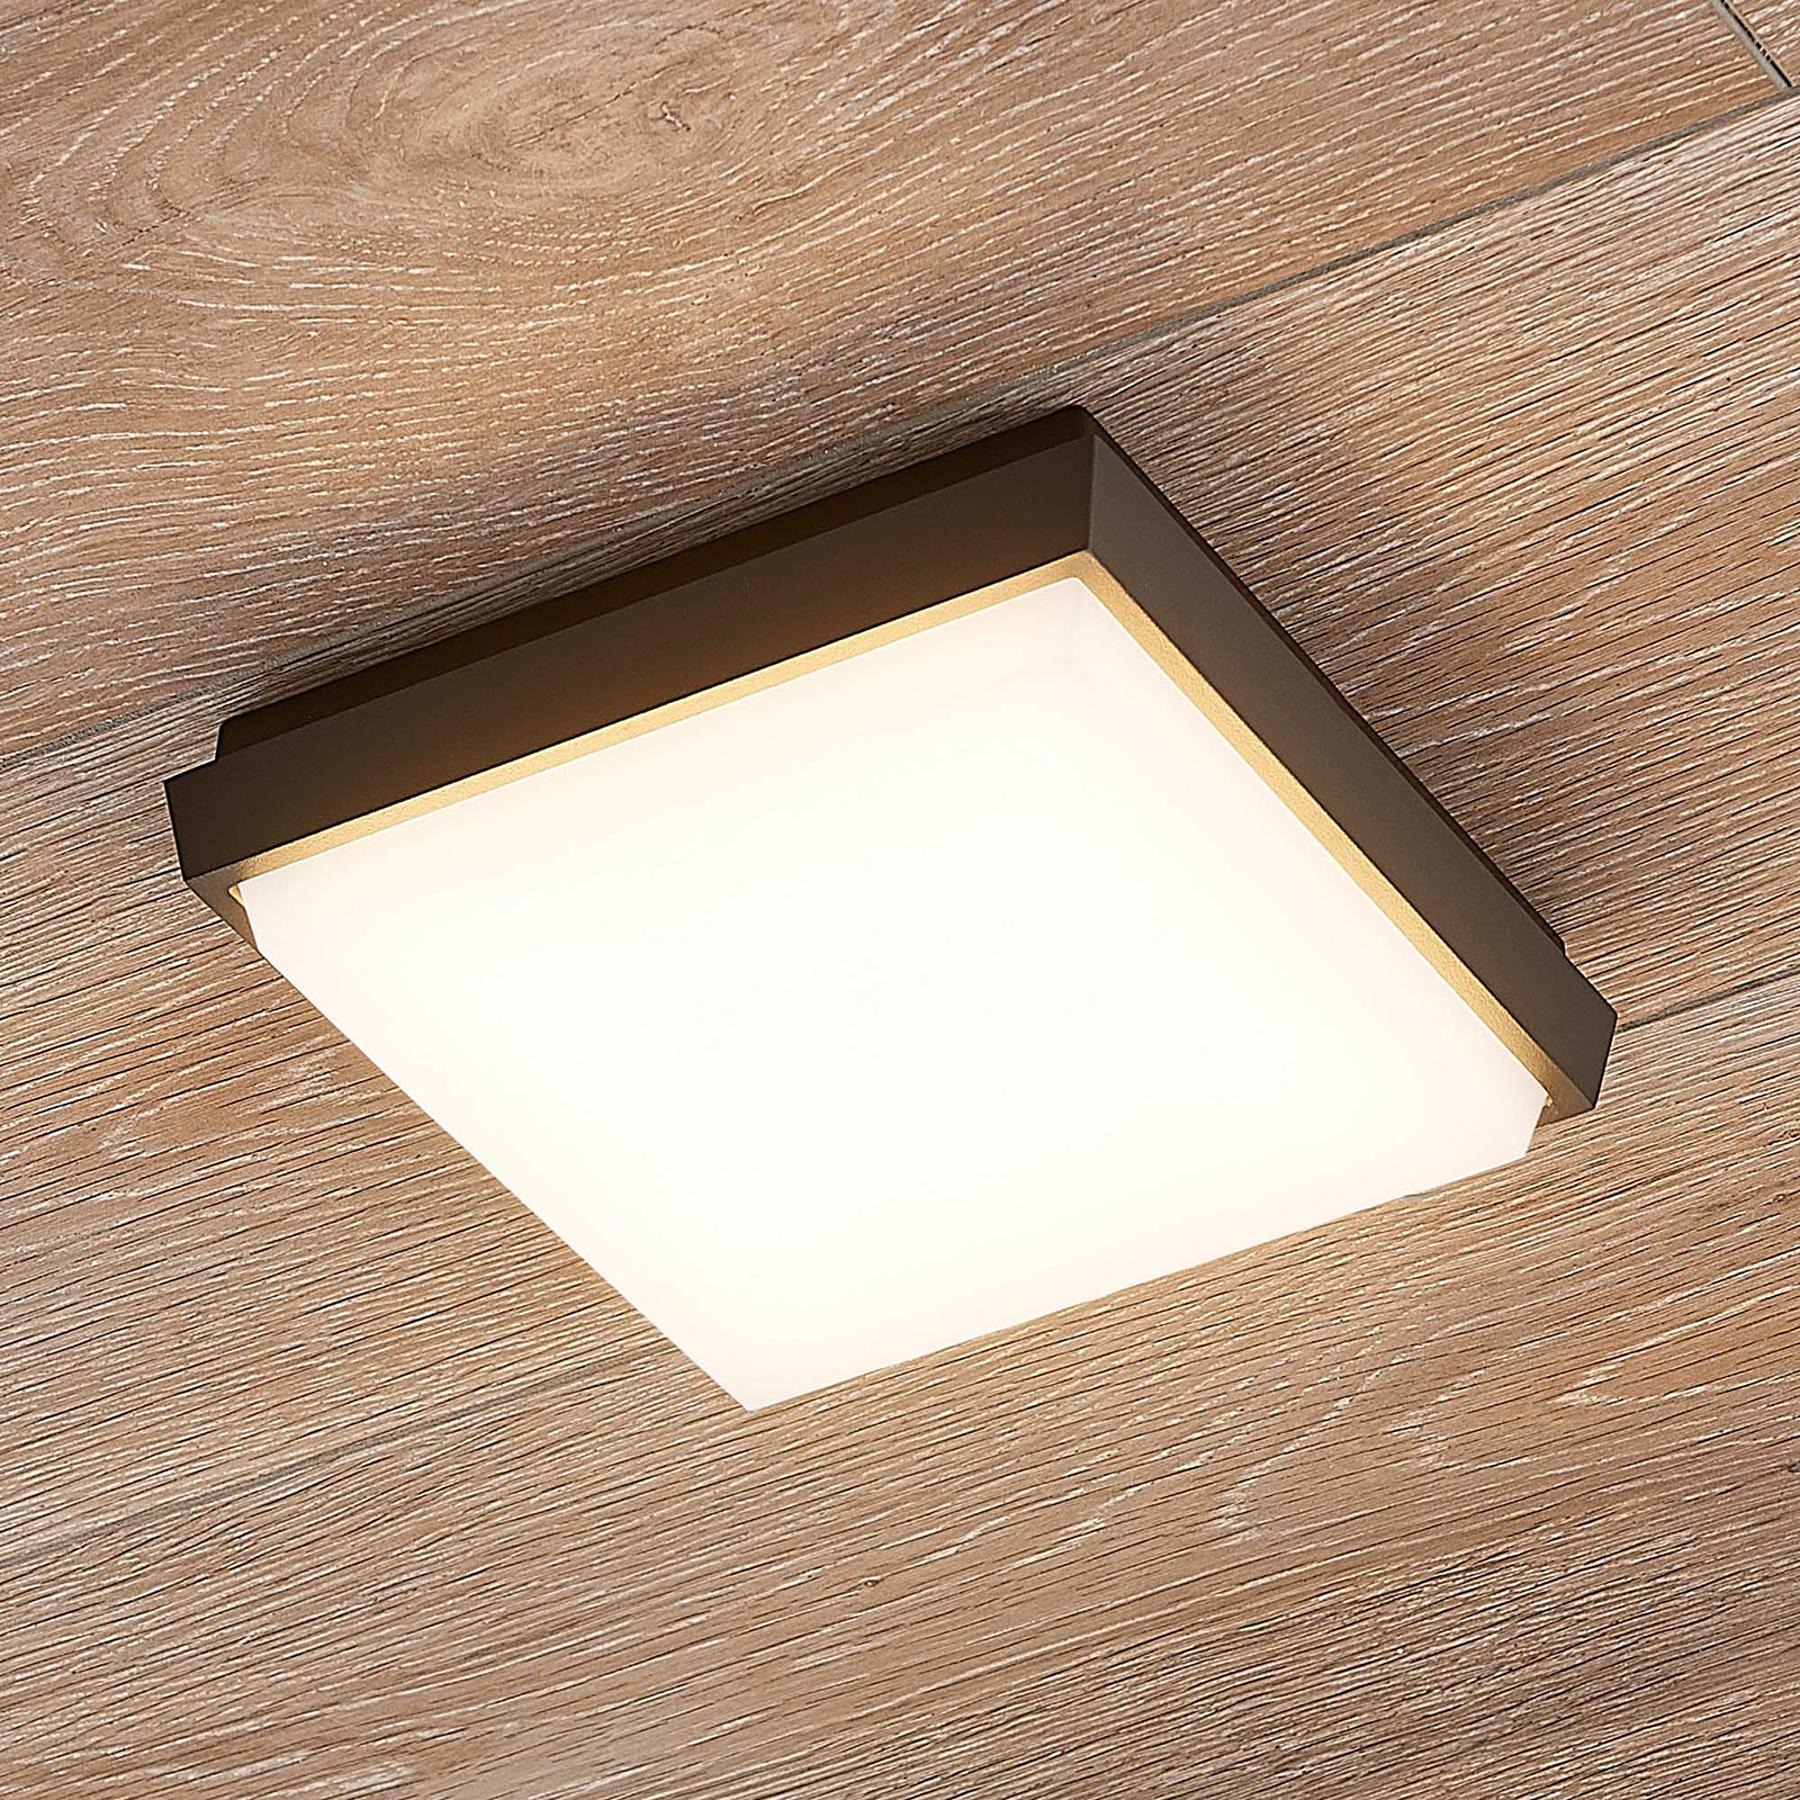 Lucande Amra plafonnier LED angulaire 17,5cm